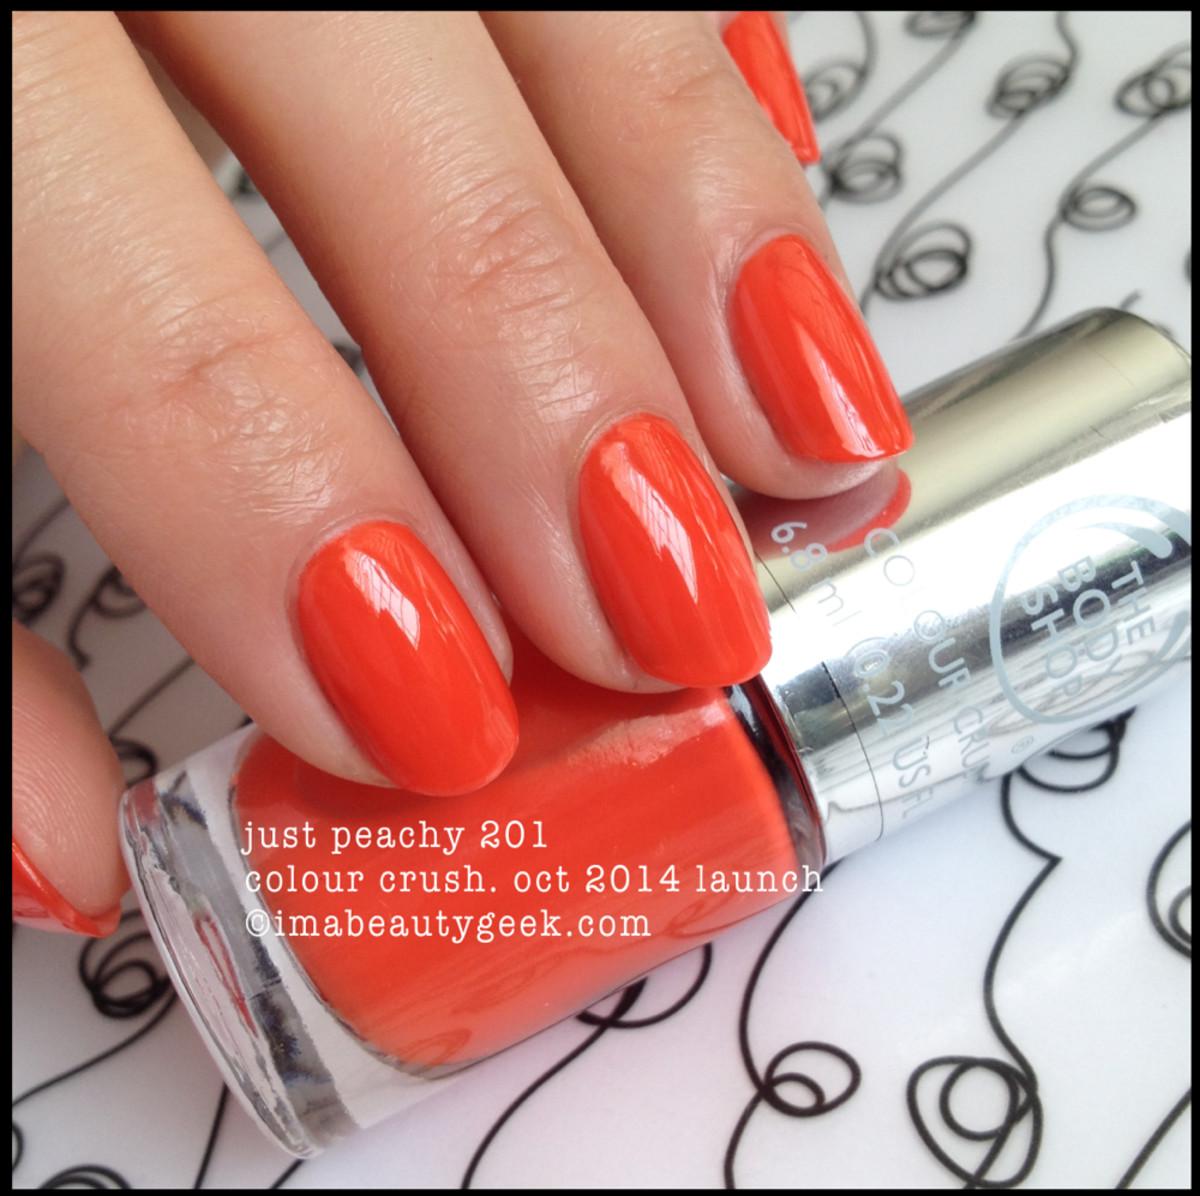 Body Shop Polish Just Peachy 201 Colour Crush